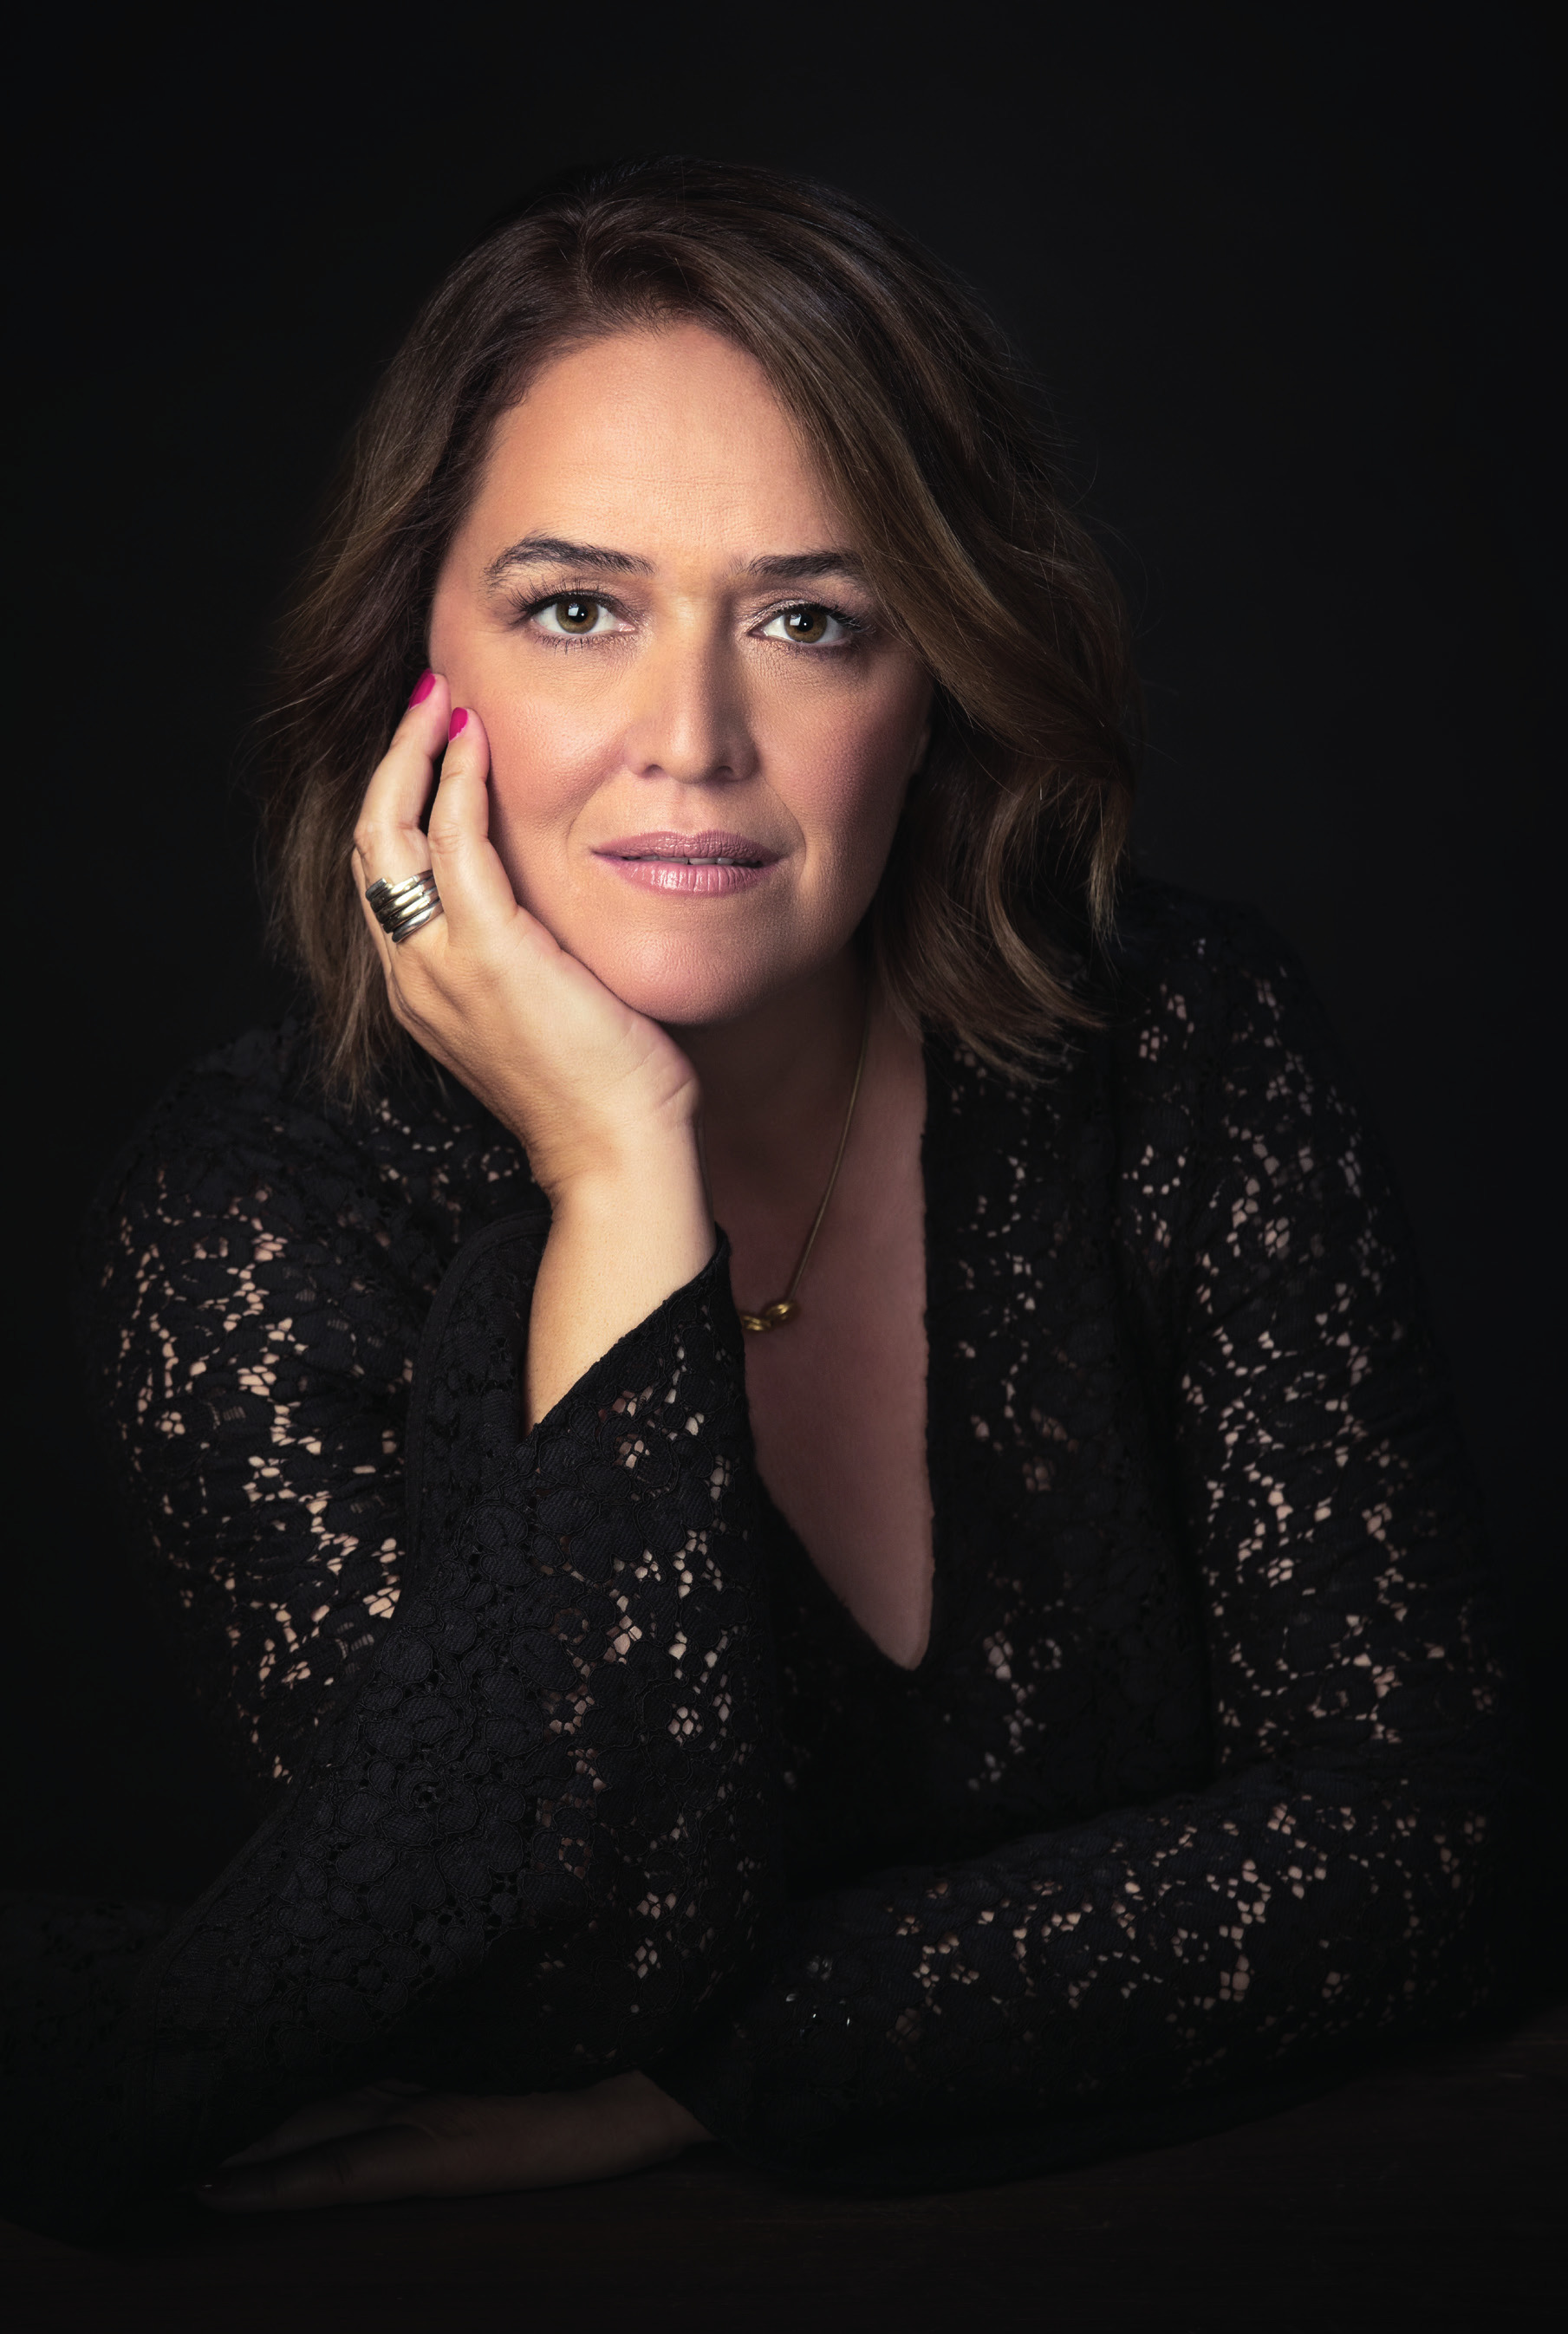 Carolina Zamudio